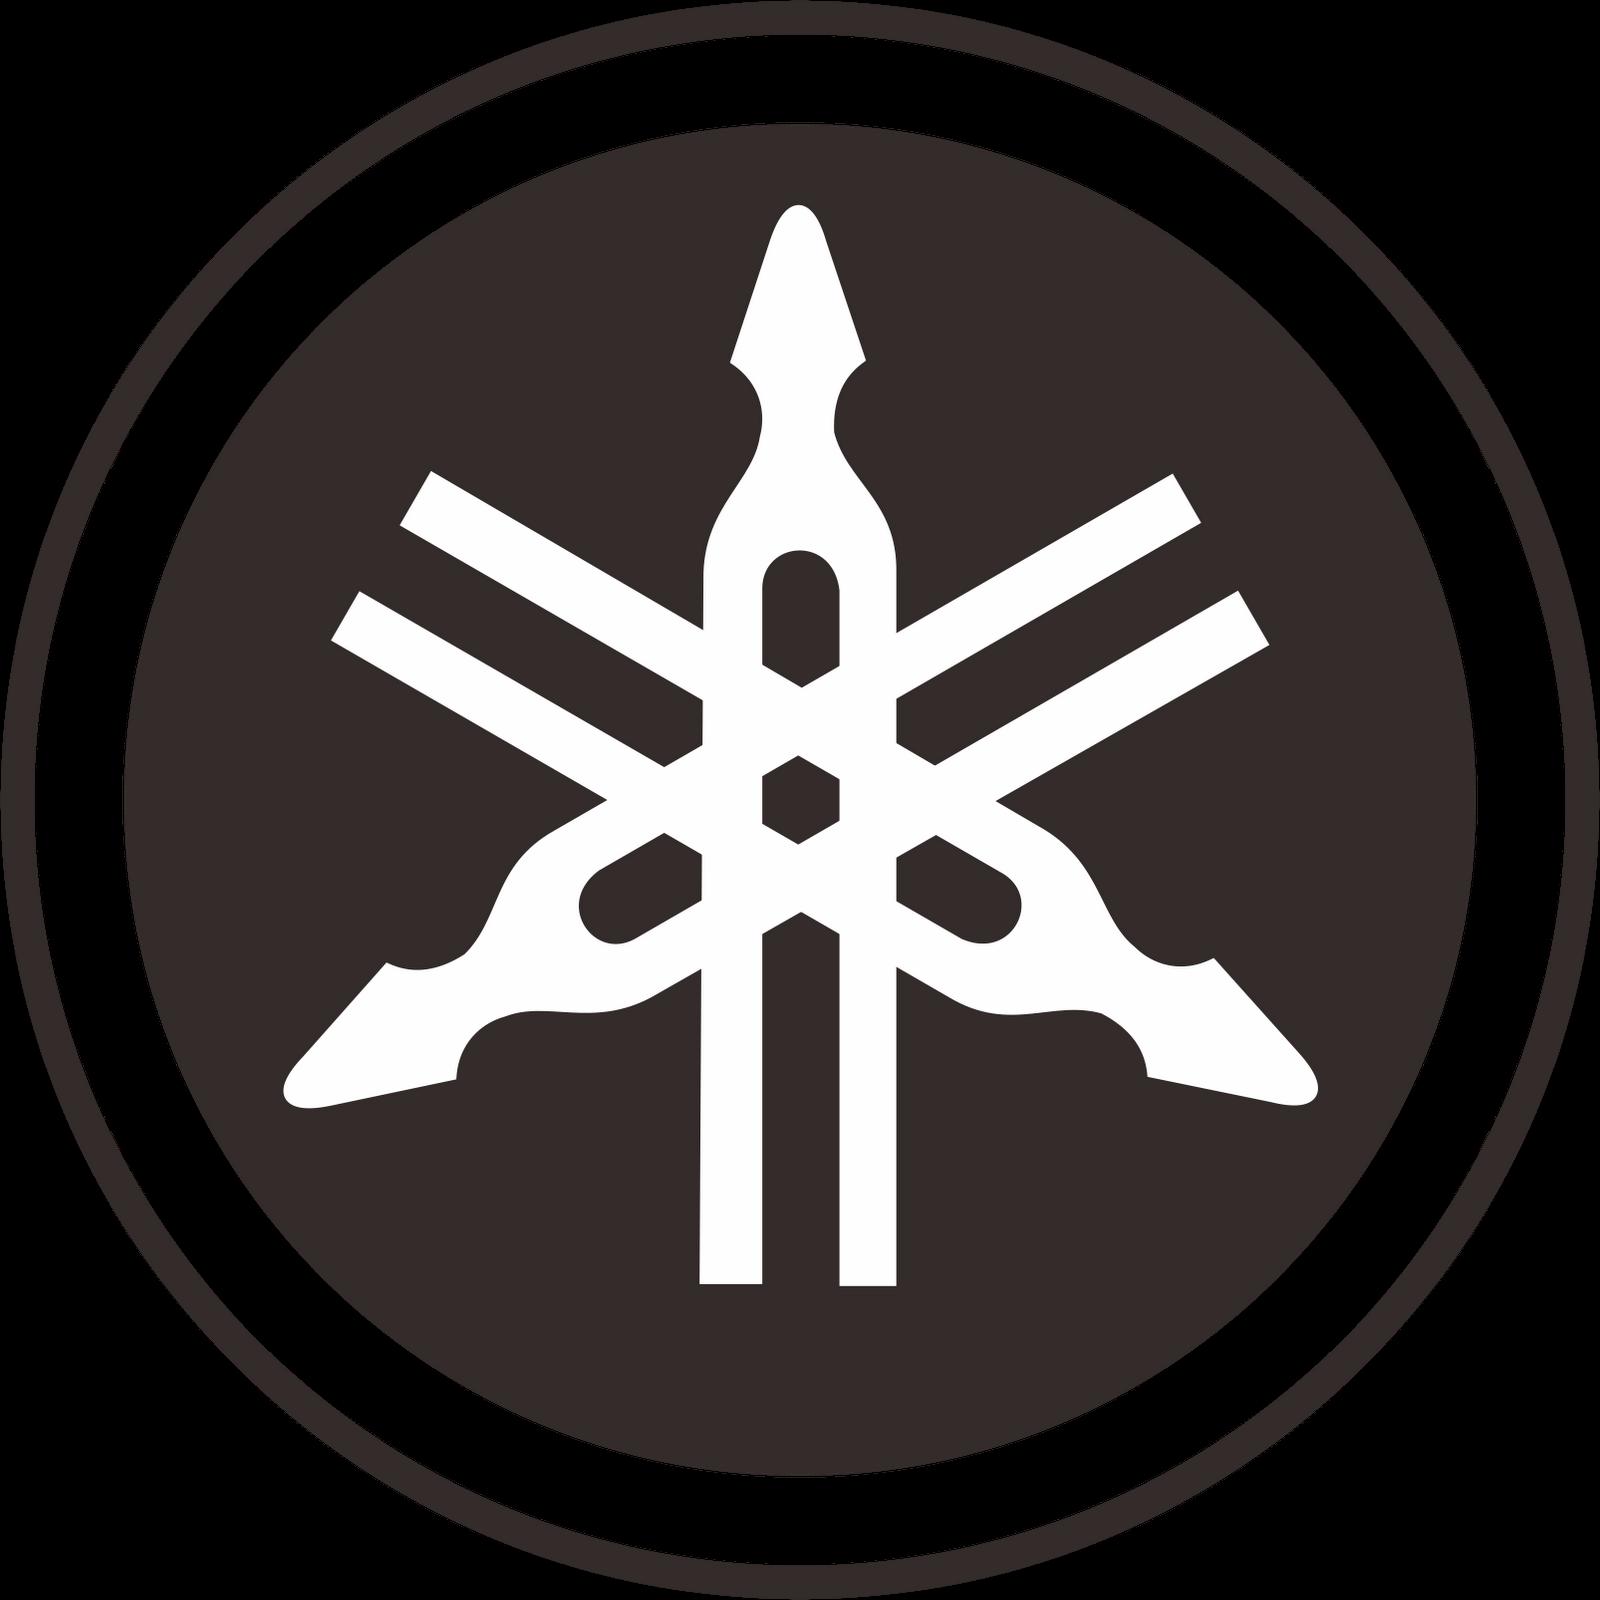 Yamaha logo sticker google zoeken